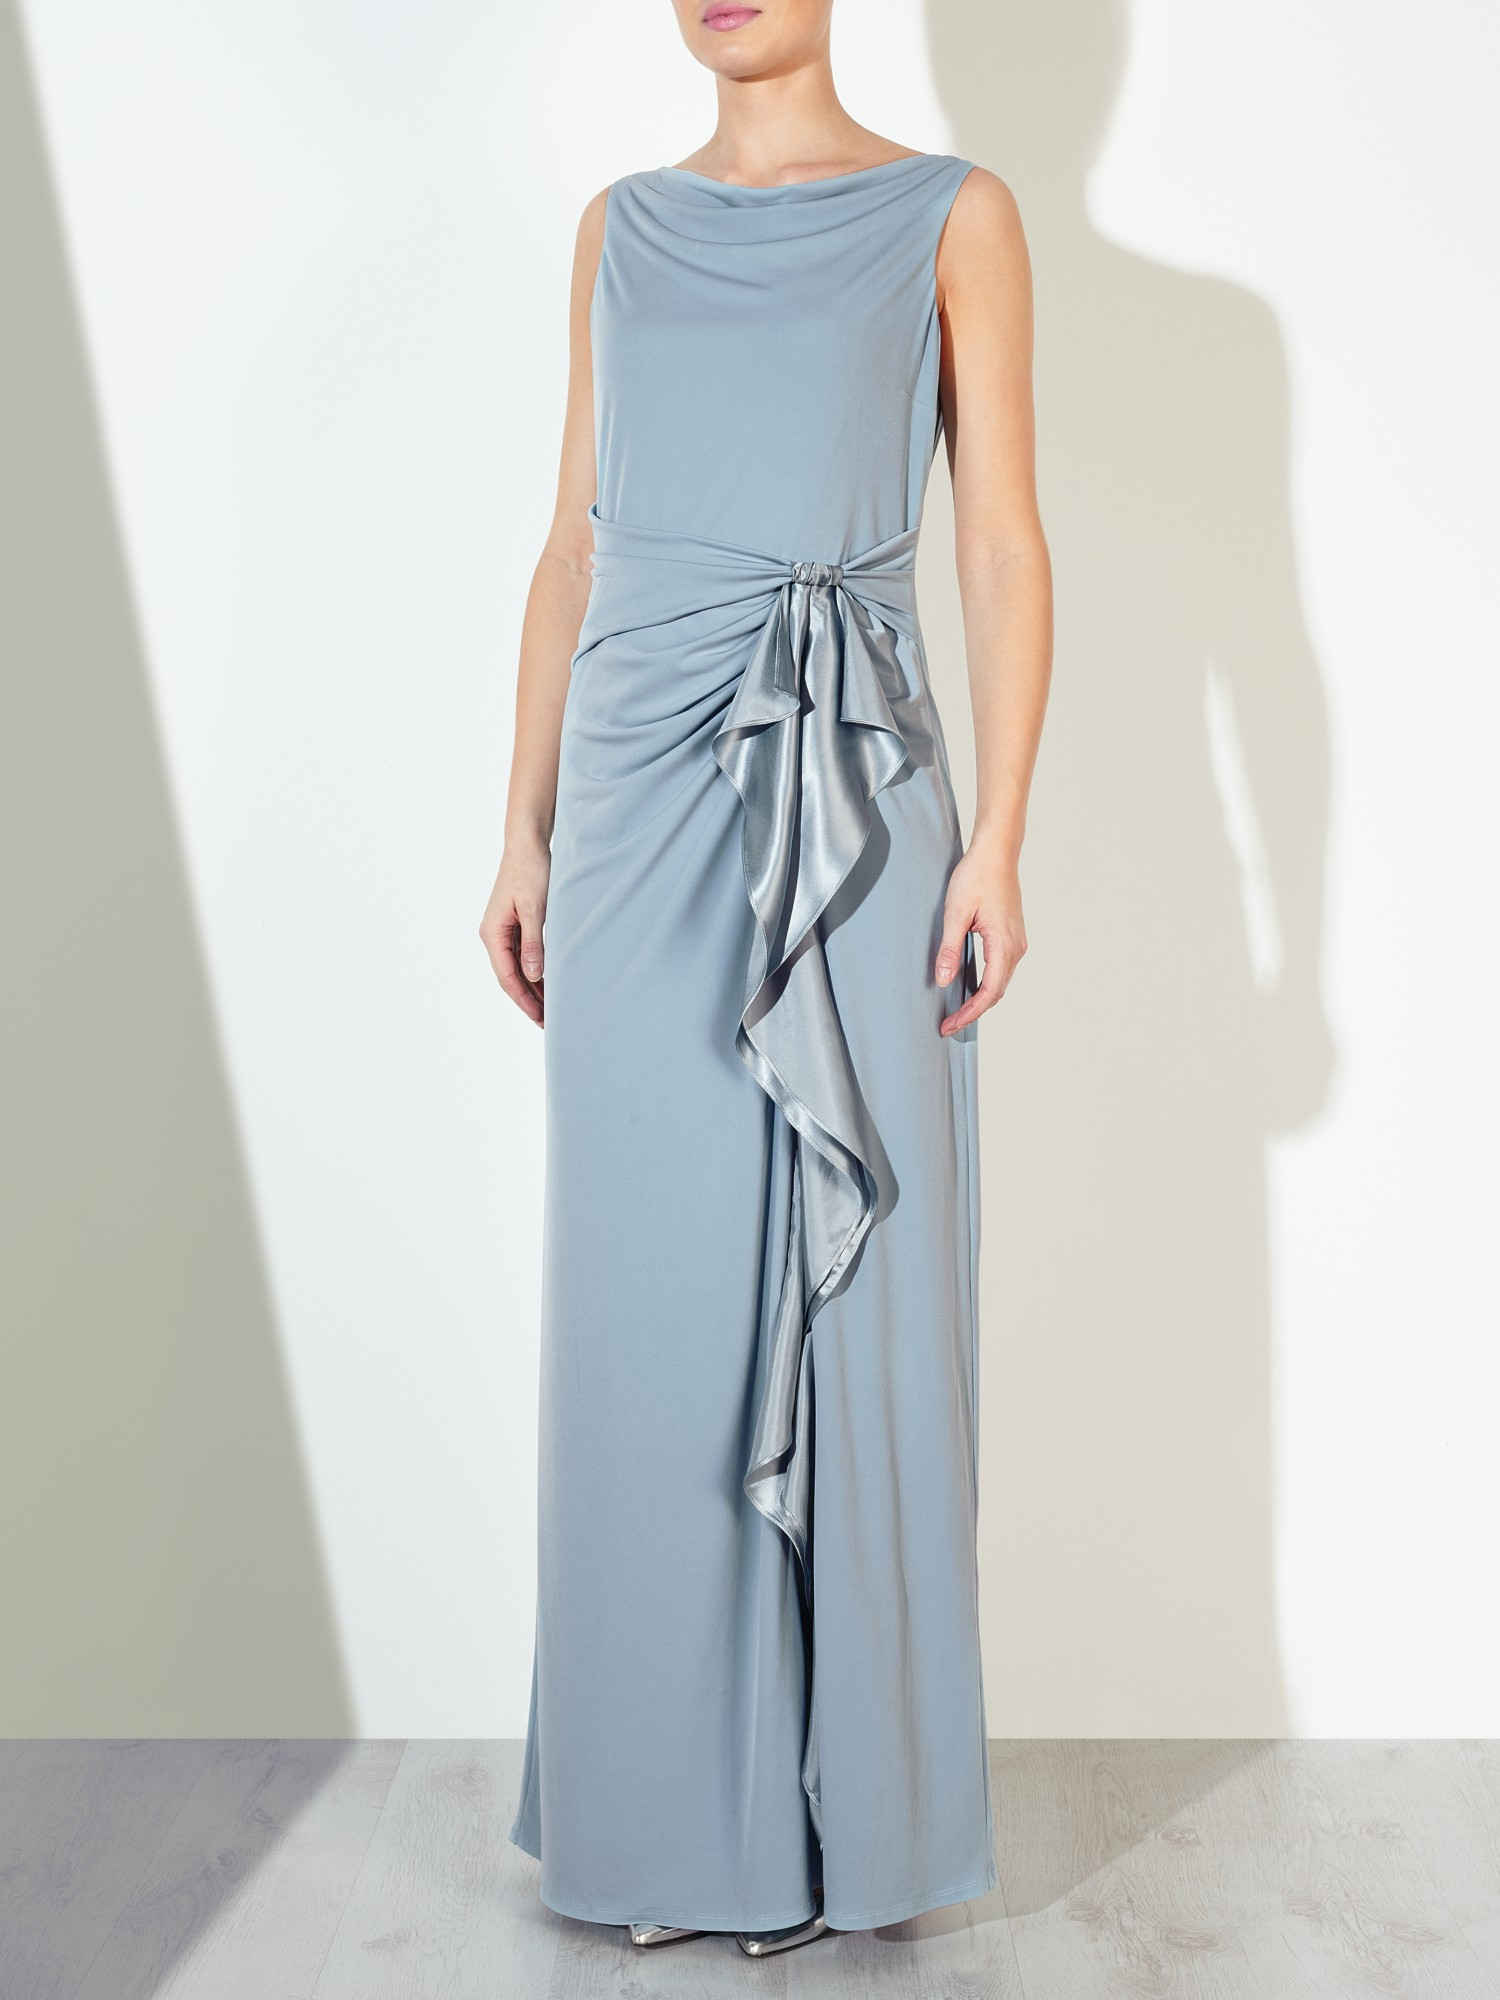 lewis darielle sleeveless jersey maxi dress in blue